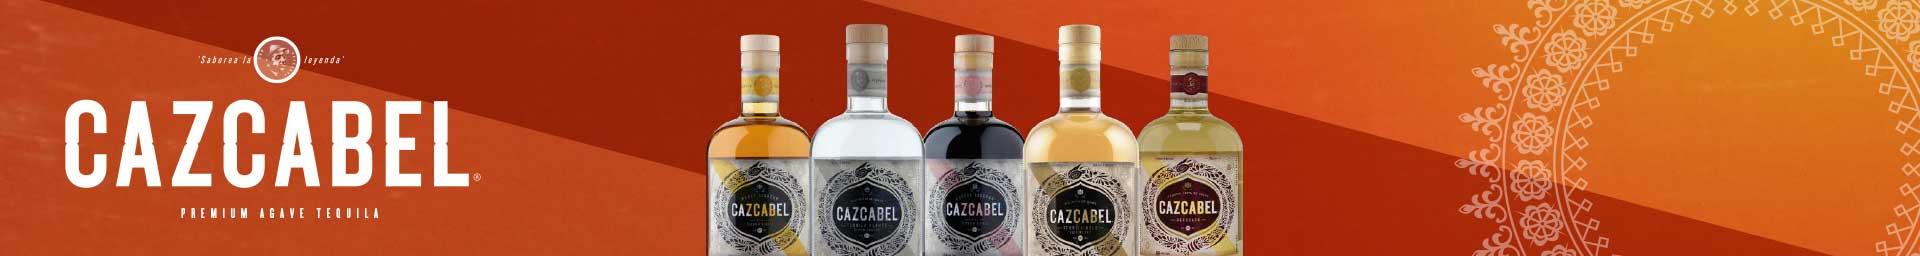 Cazcabel Tequila